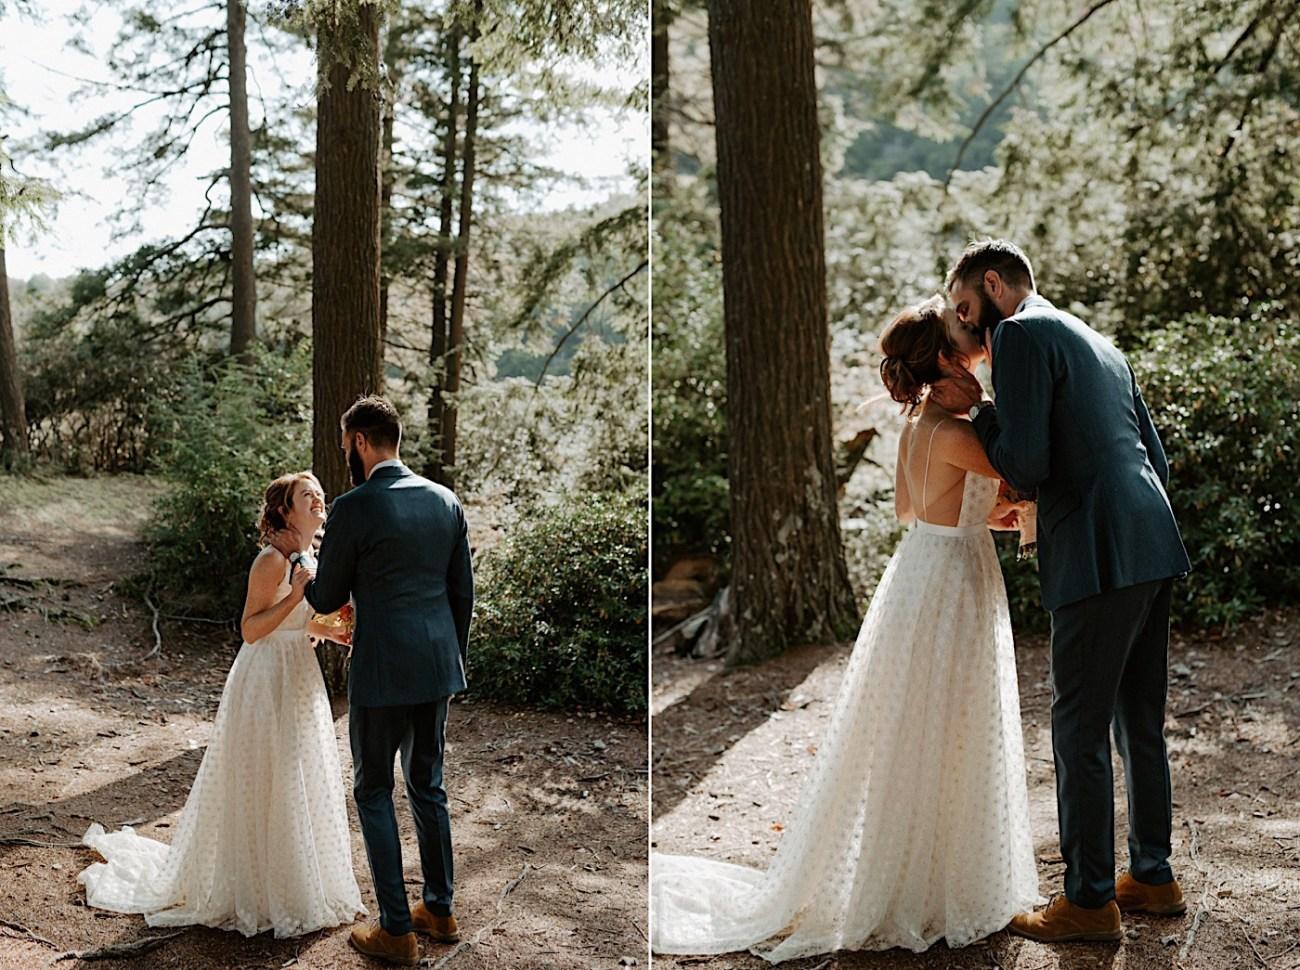 Destination Lakeside Wedding Mt Washington Wedding Outdoor Wedding Boston Wedding Photographer 027